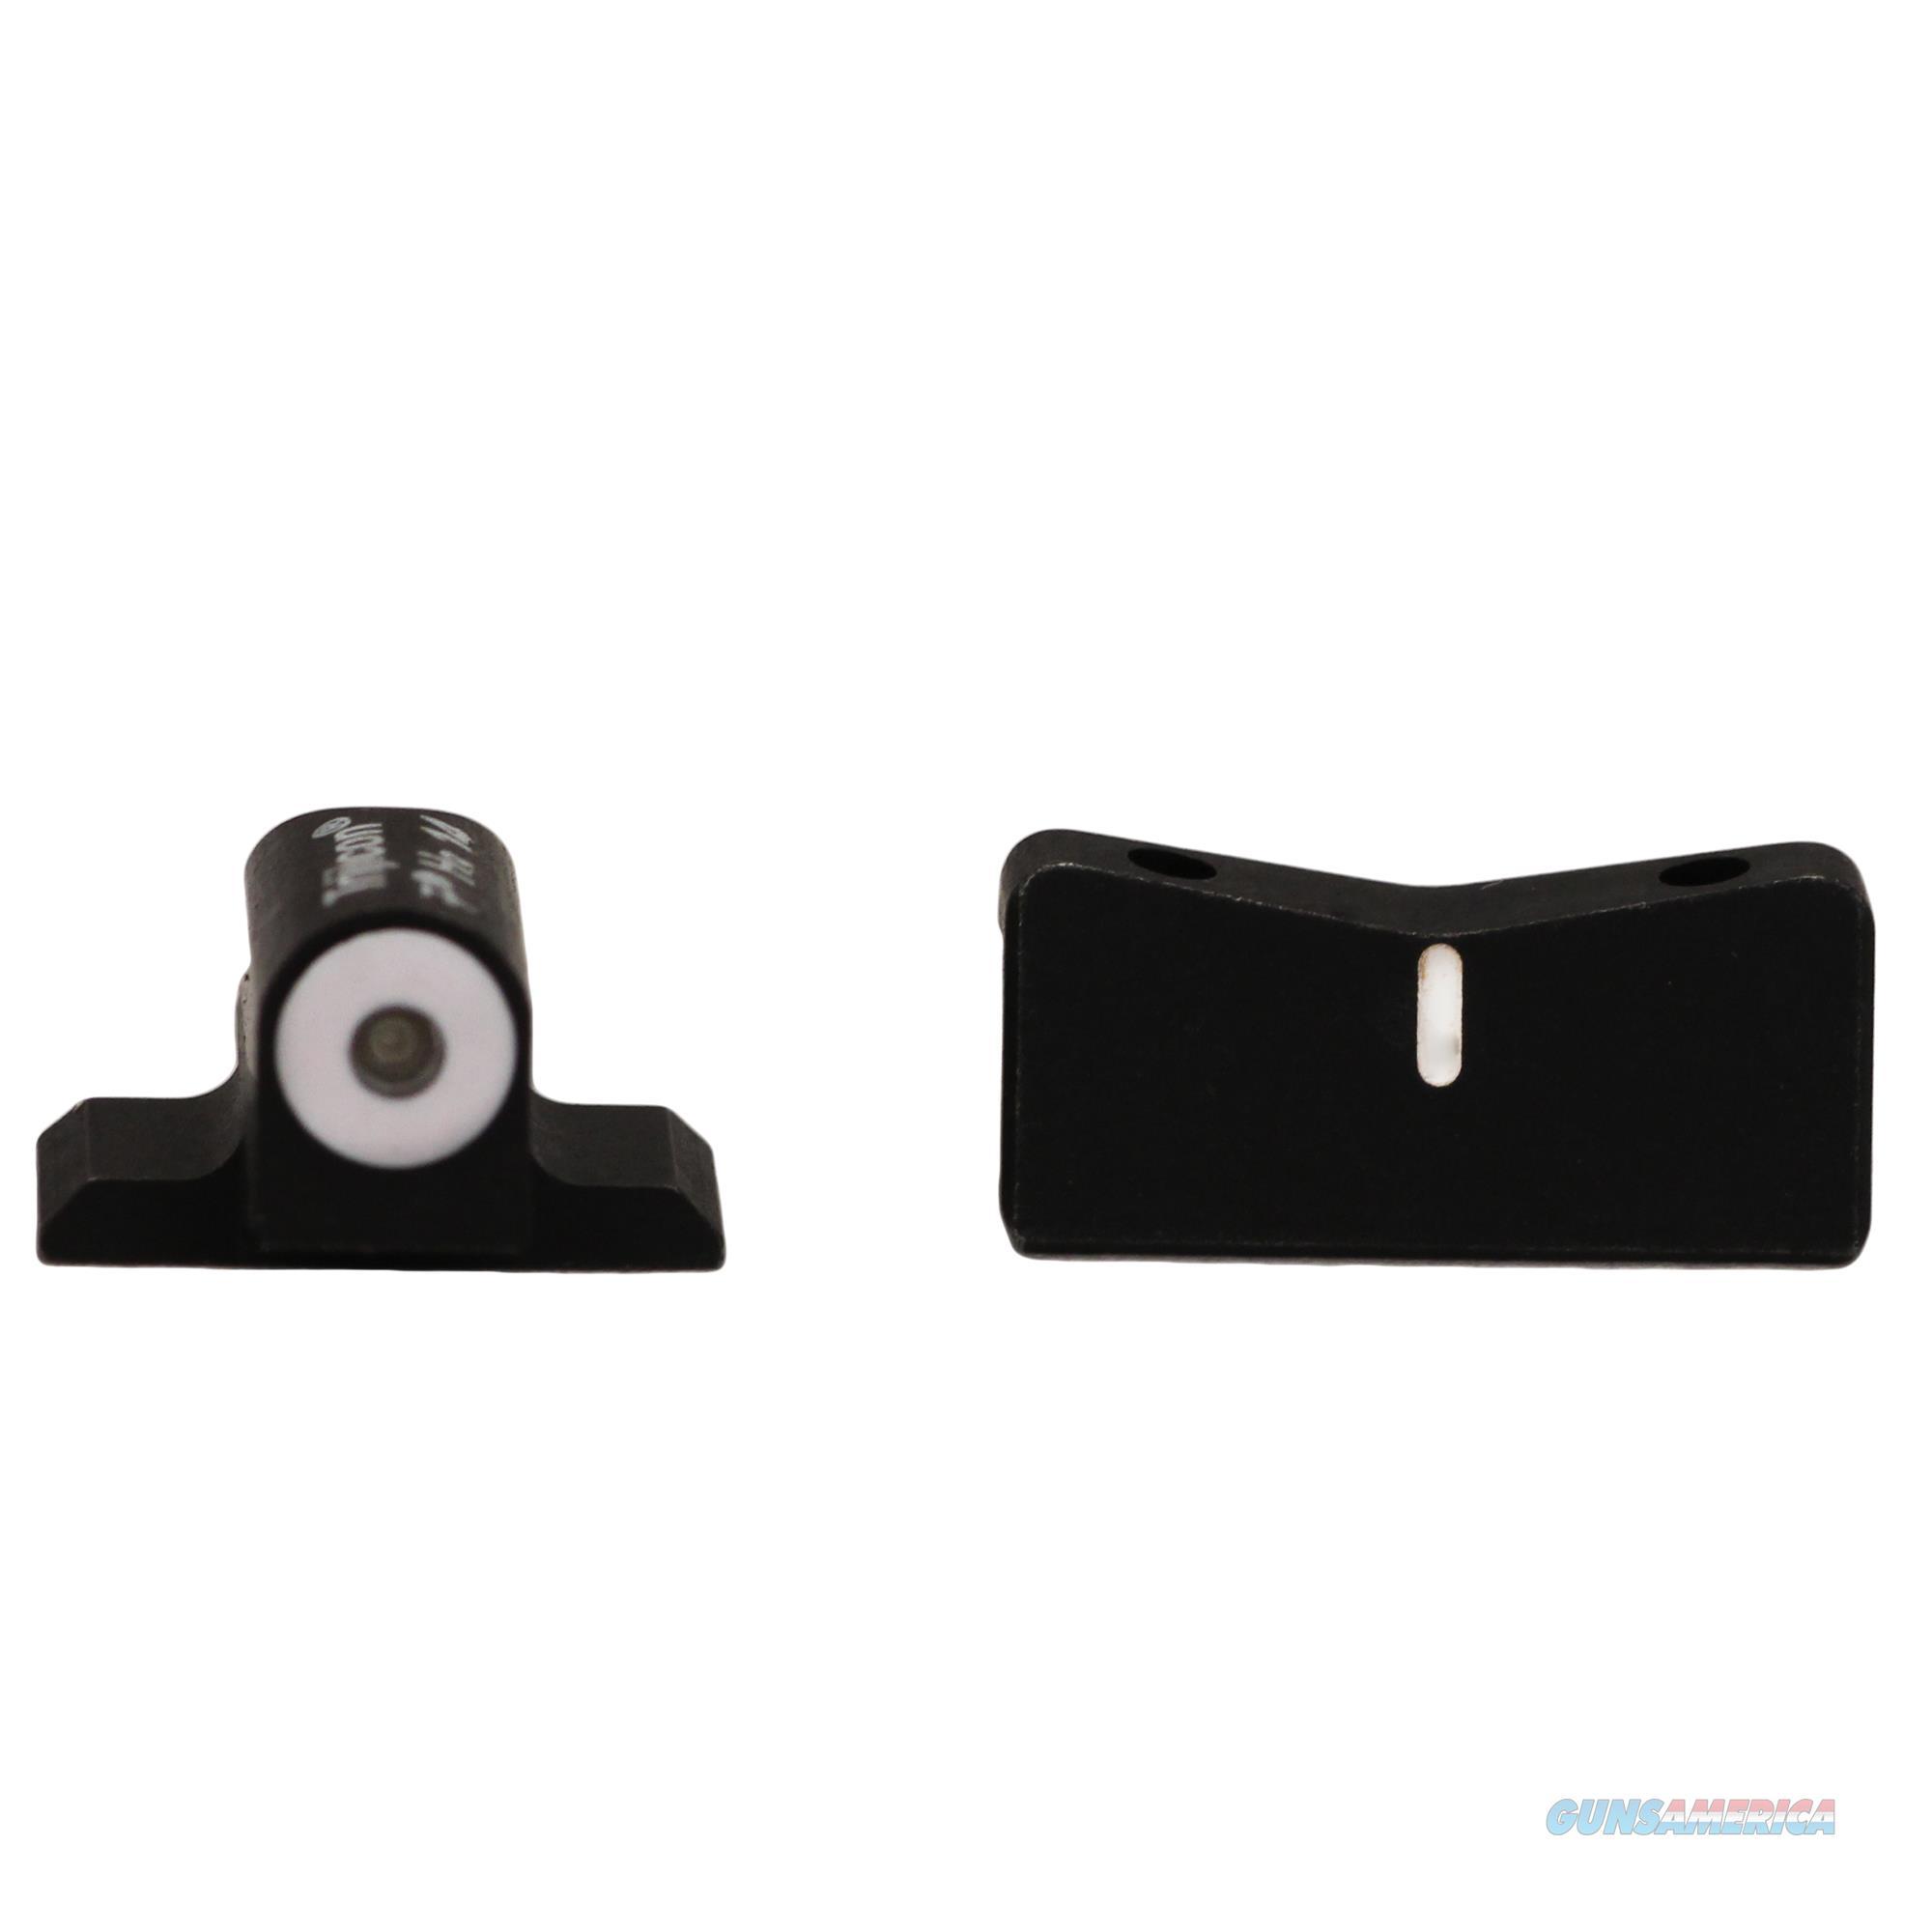 Xs Sights Dxw Big Dot SI-0002S-3  Non-Guns > Iron/Metal/Peep Sights